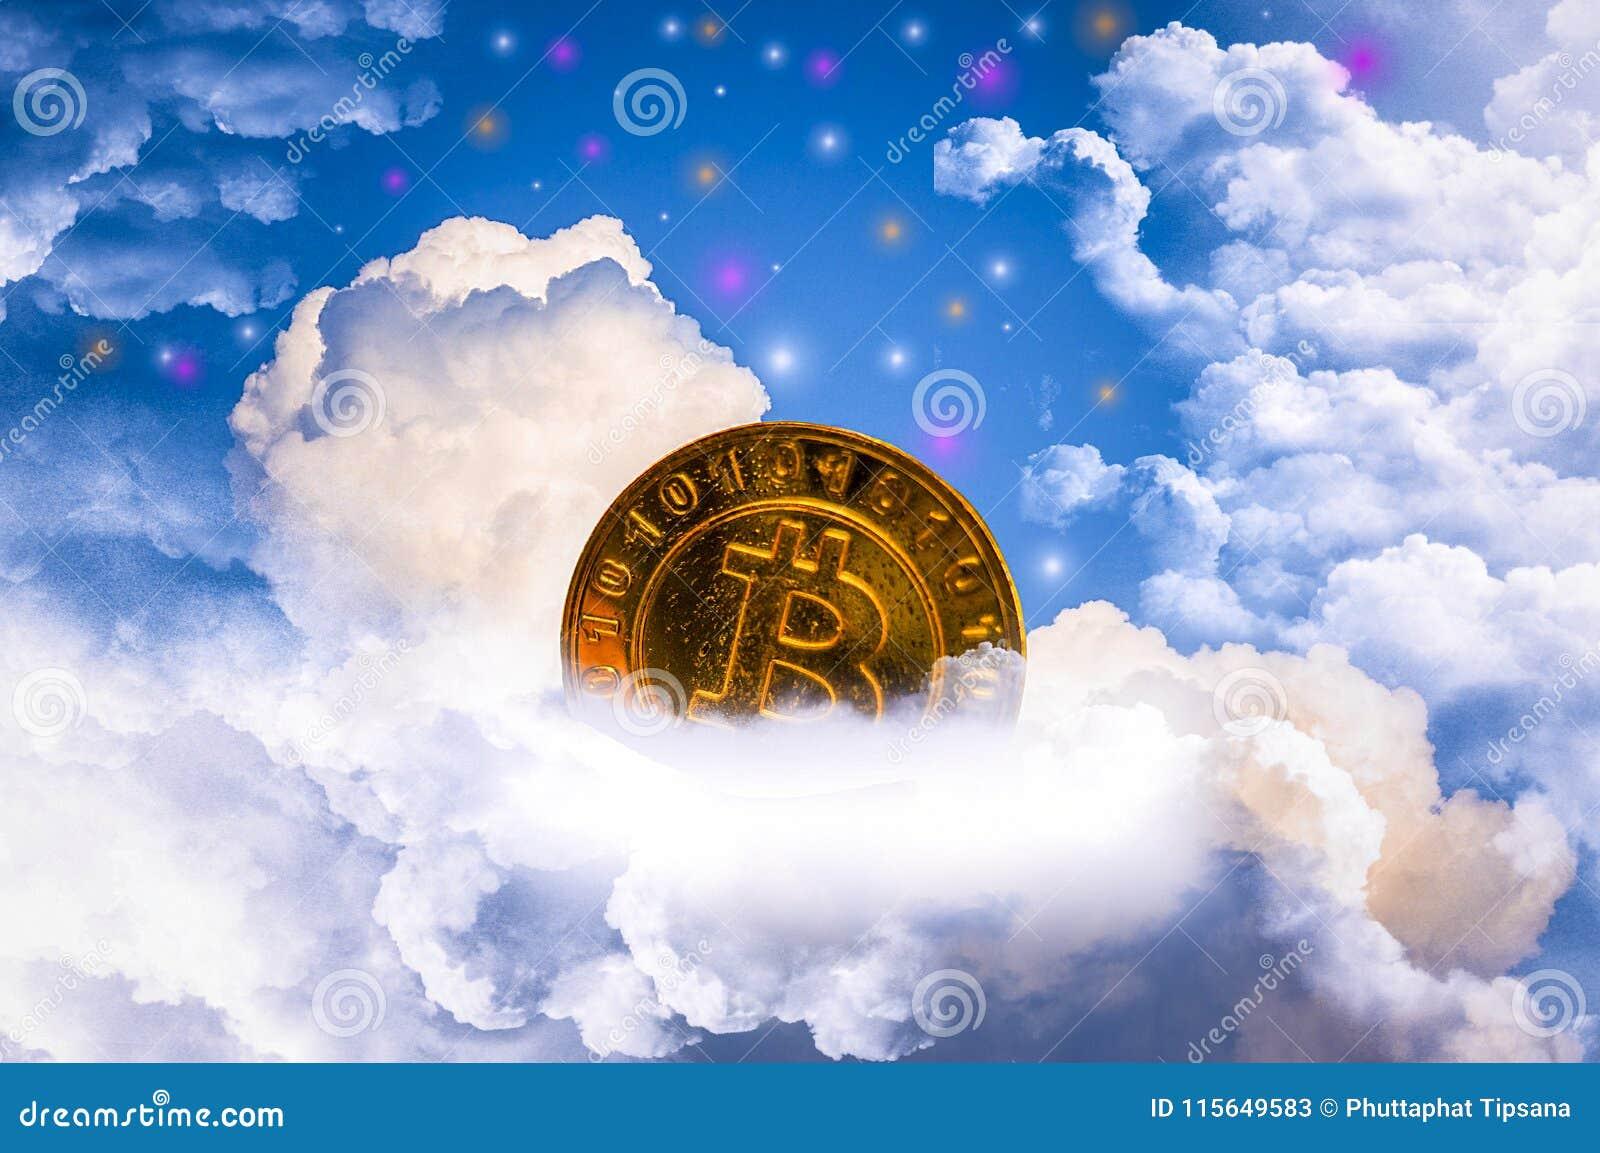 sec sustoja bitcoin trading